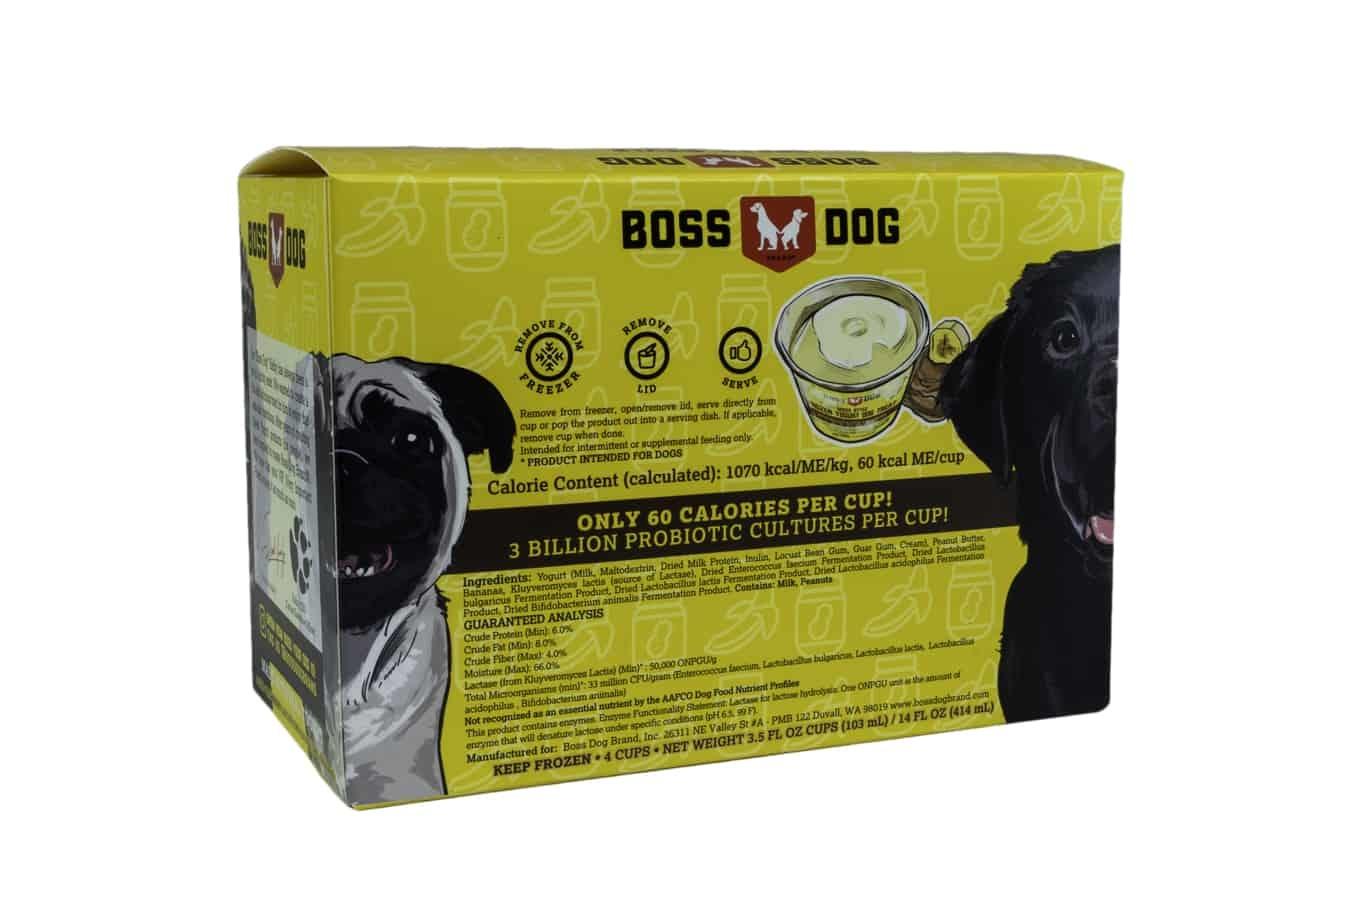 Boss Dog Boss Dog Greek Style Frozen Yogurt with Peanut Butter and Banana 3.5oz - 4 Pack